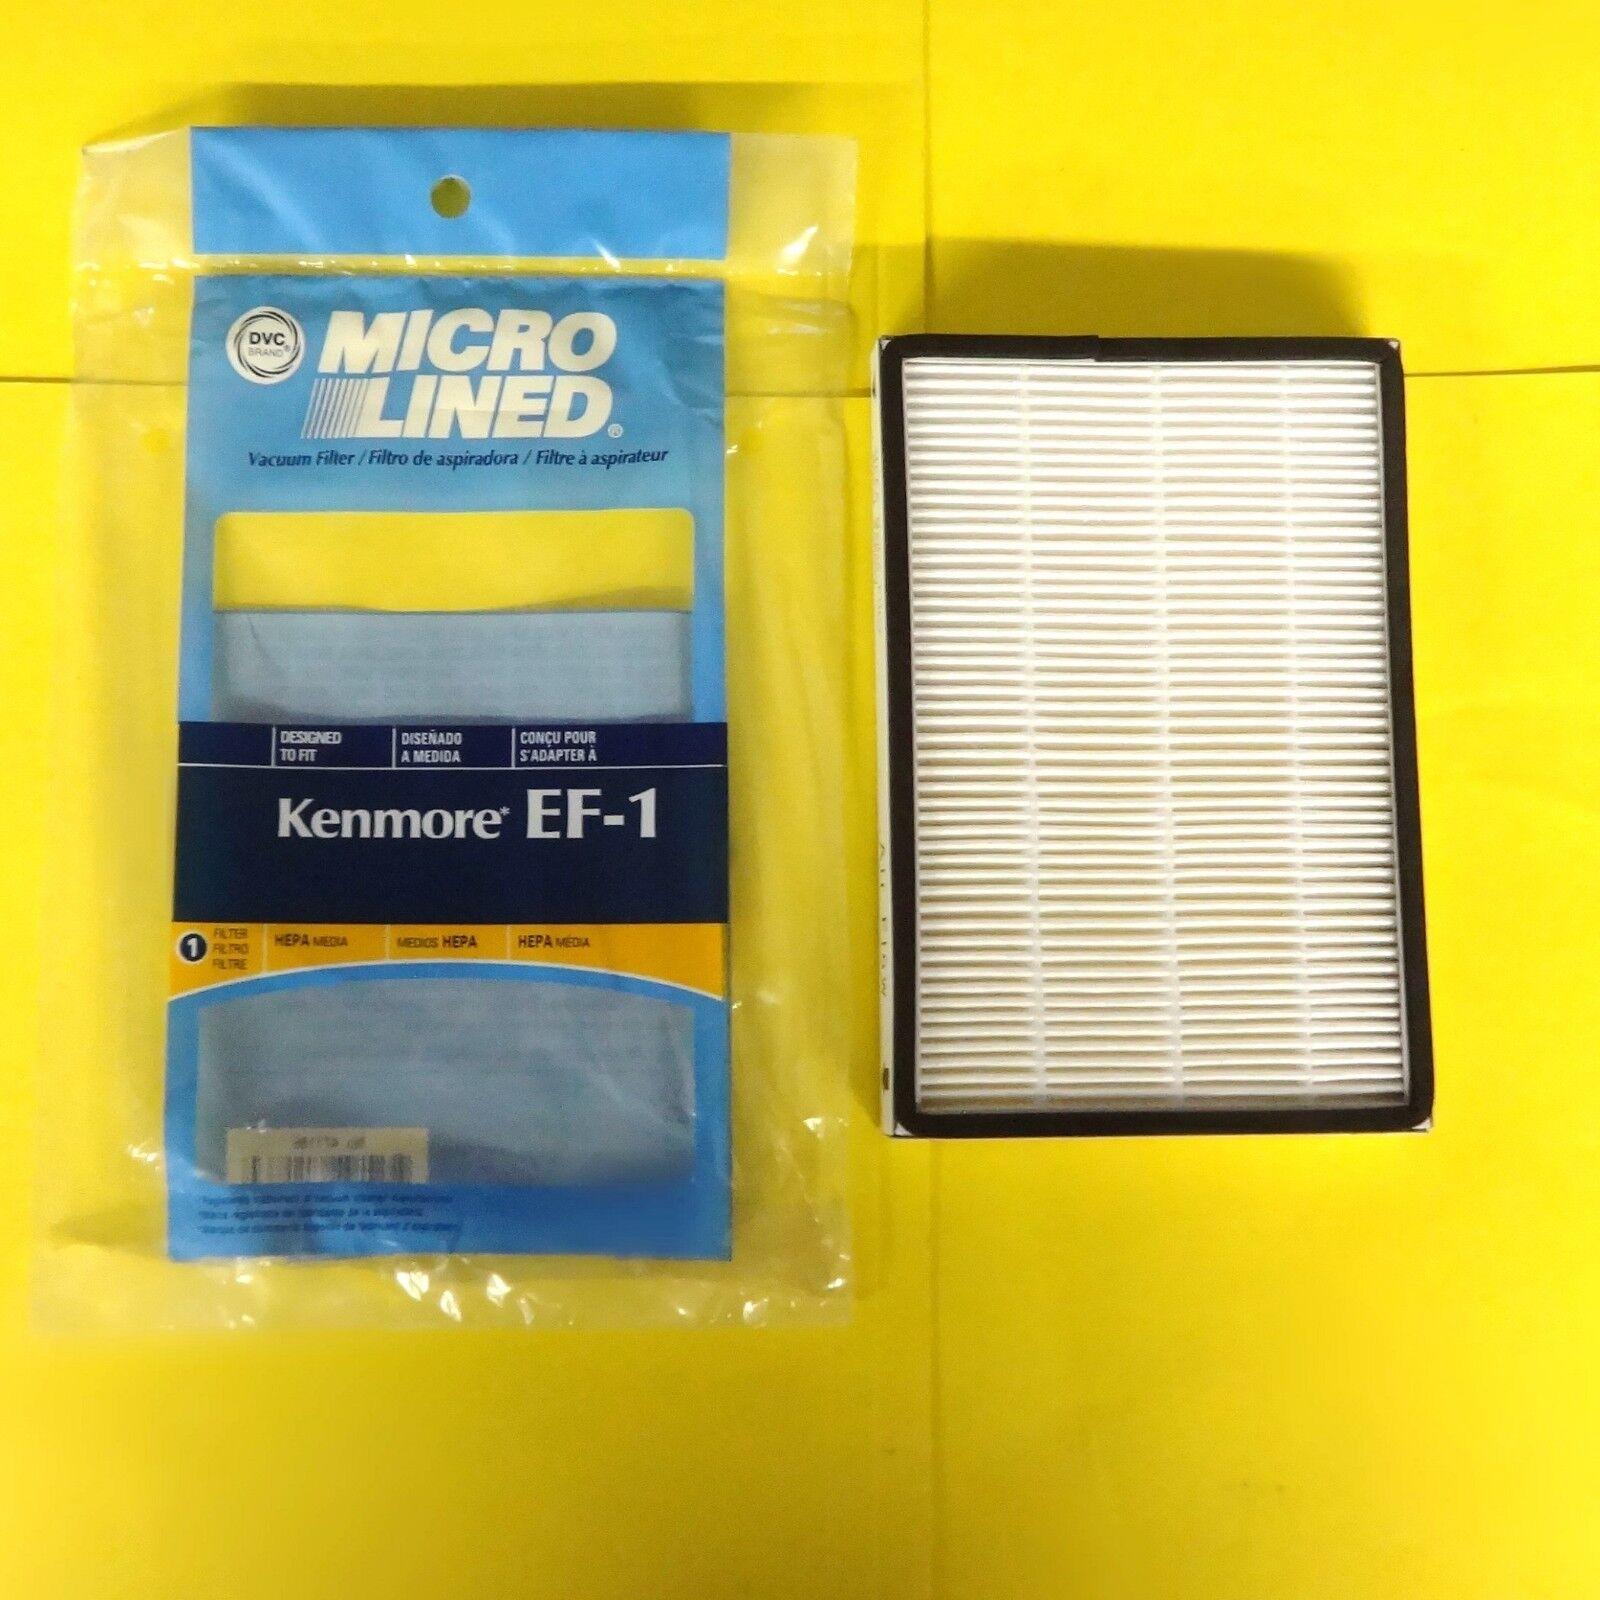 Kenmore Vacuum Filter EF-1  86889 EF-1 Exhaust HEPA